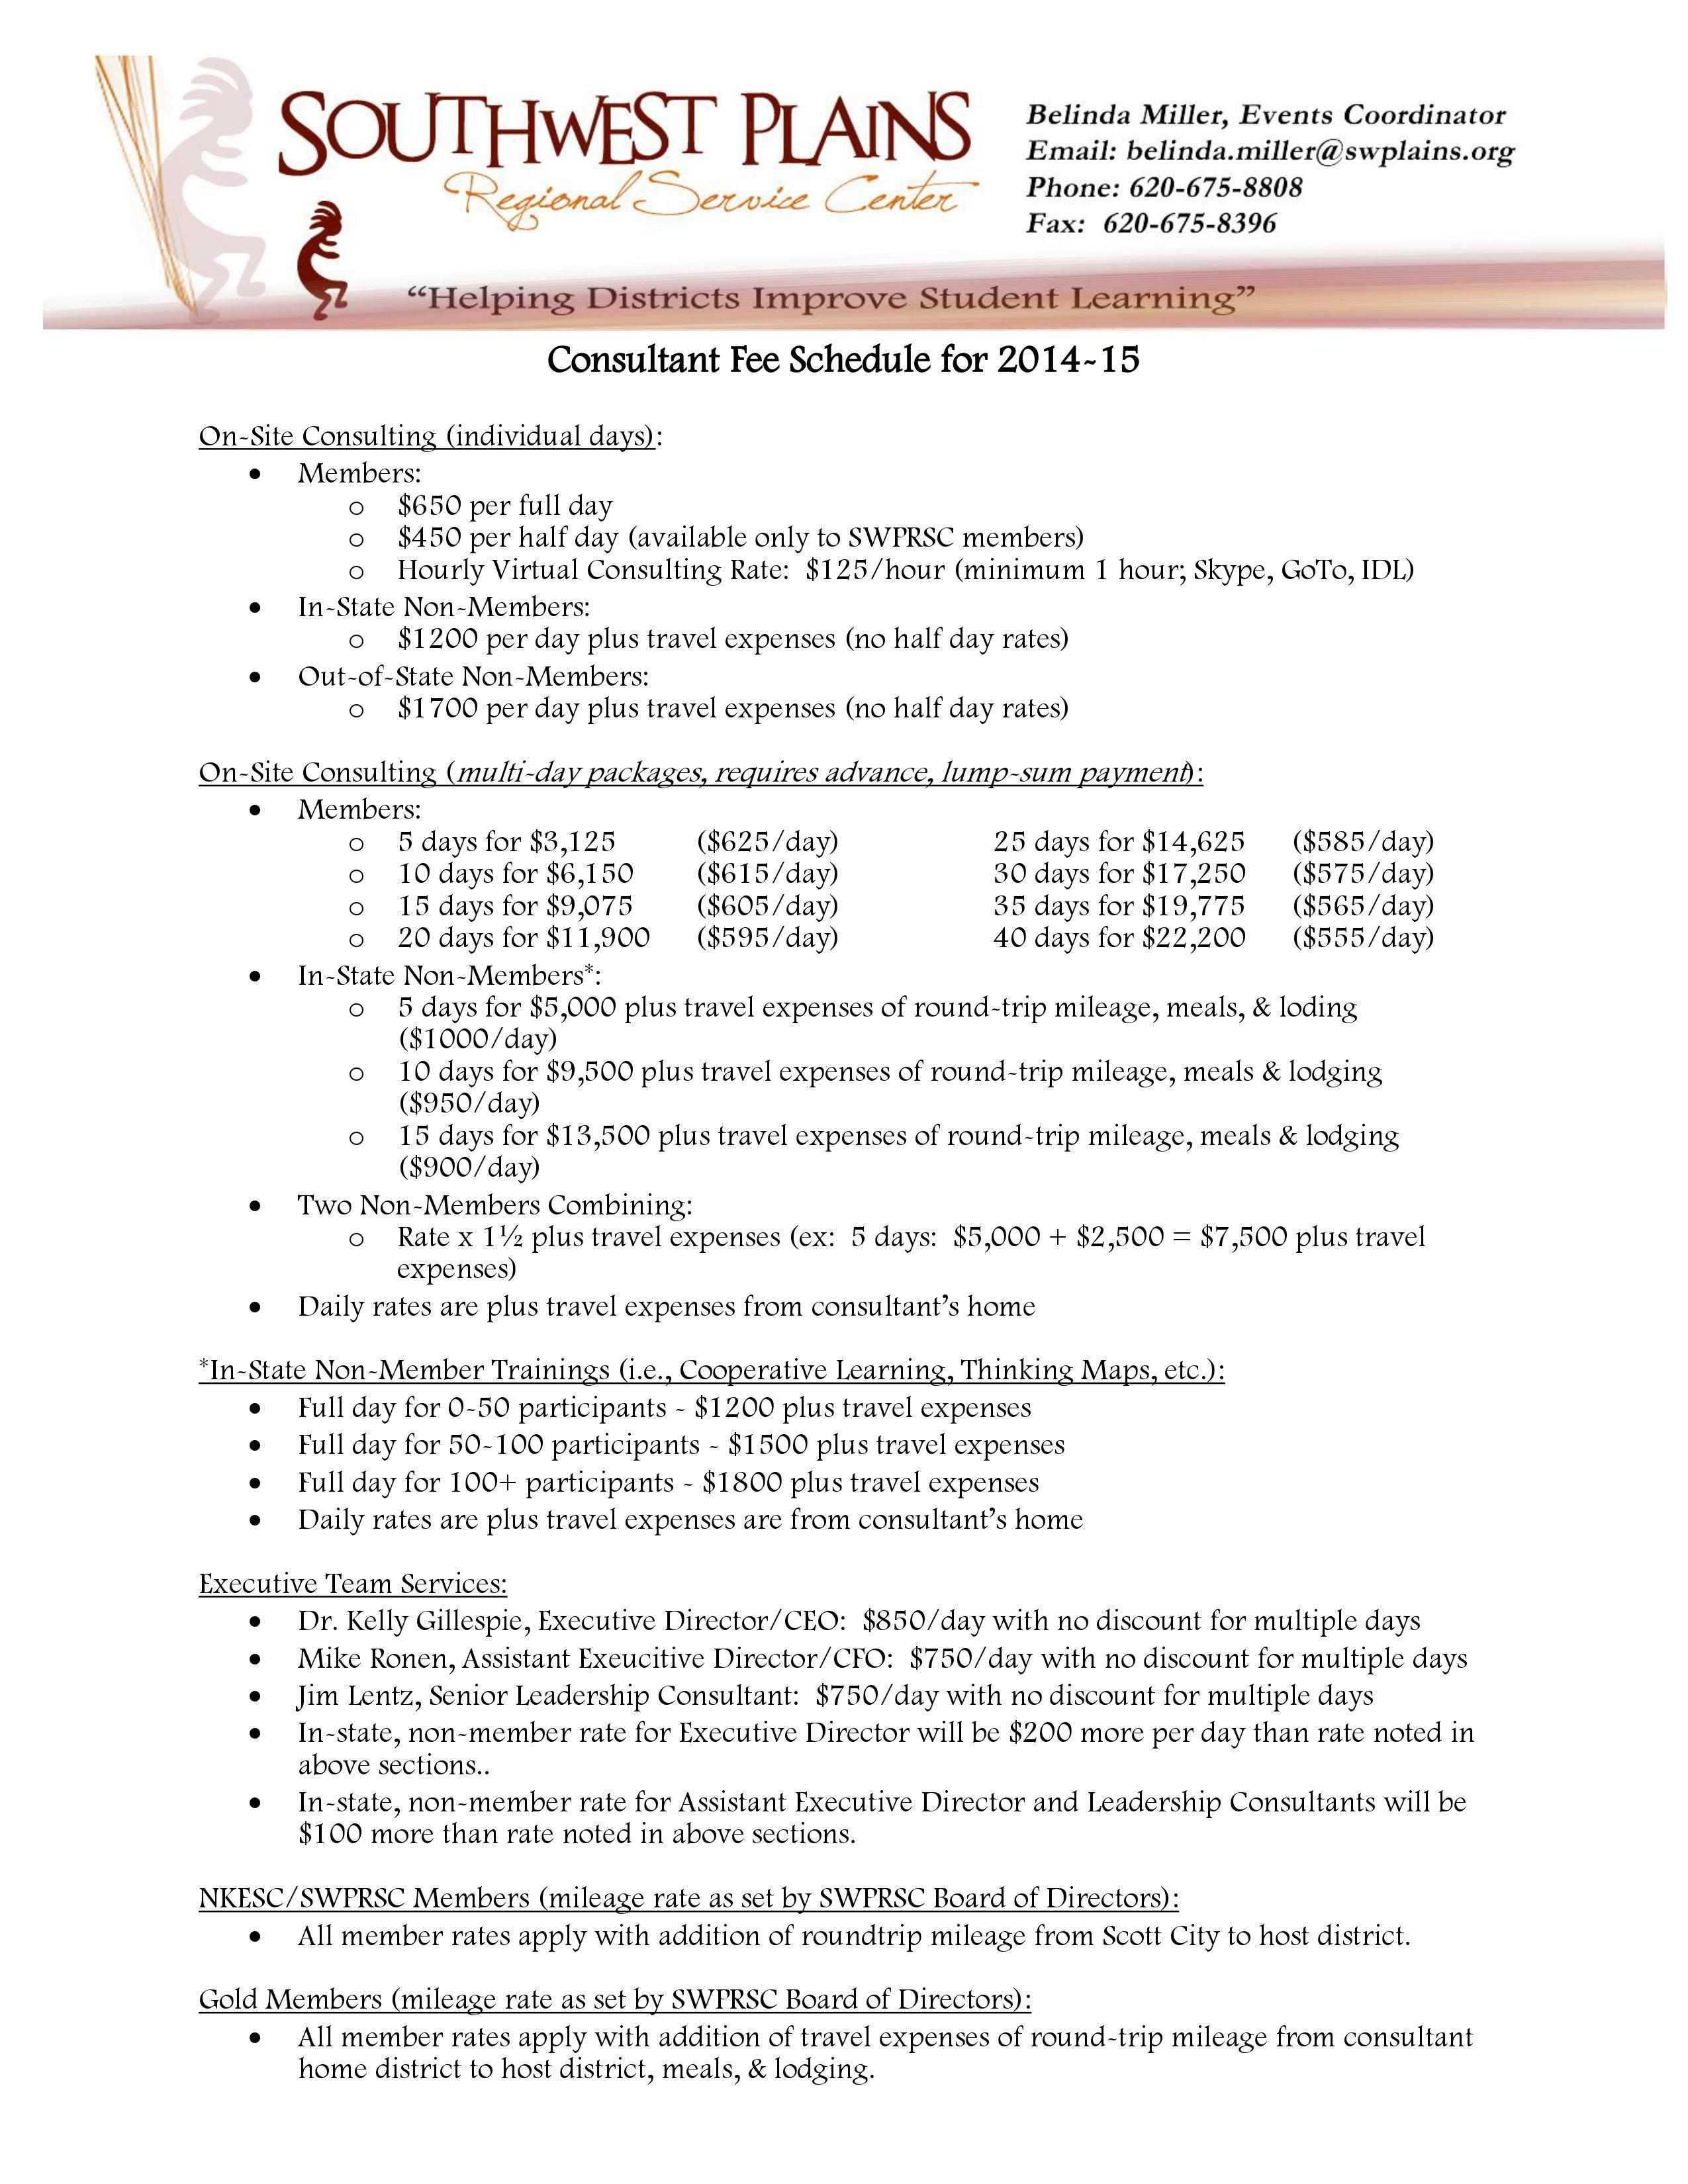 002 Phenomenal Consultant Fee Schedule Template Design Full